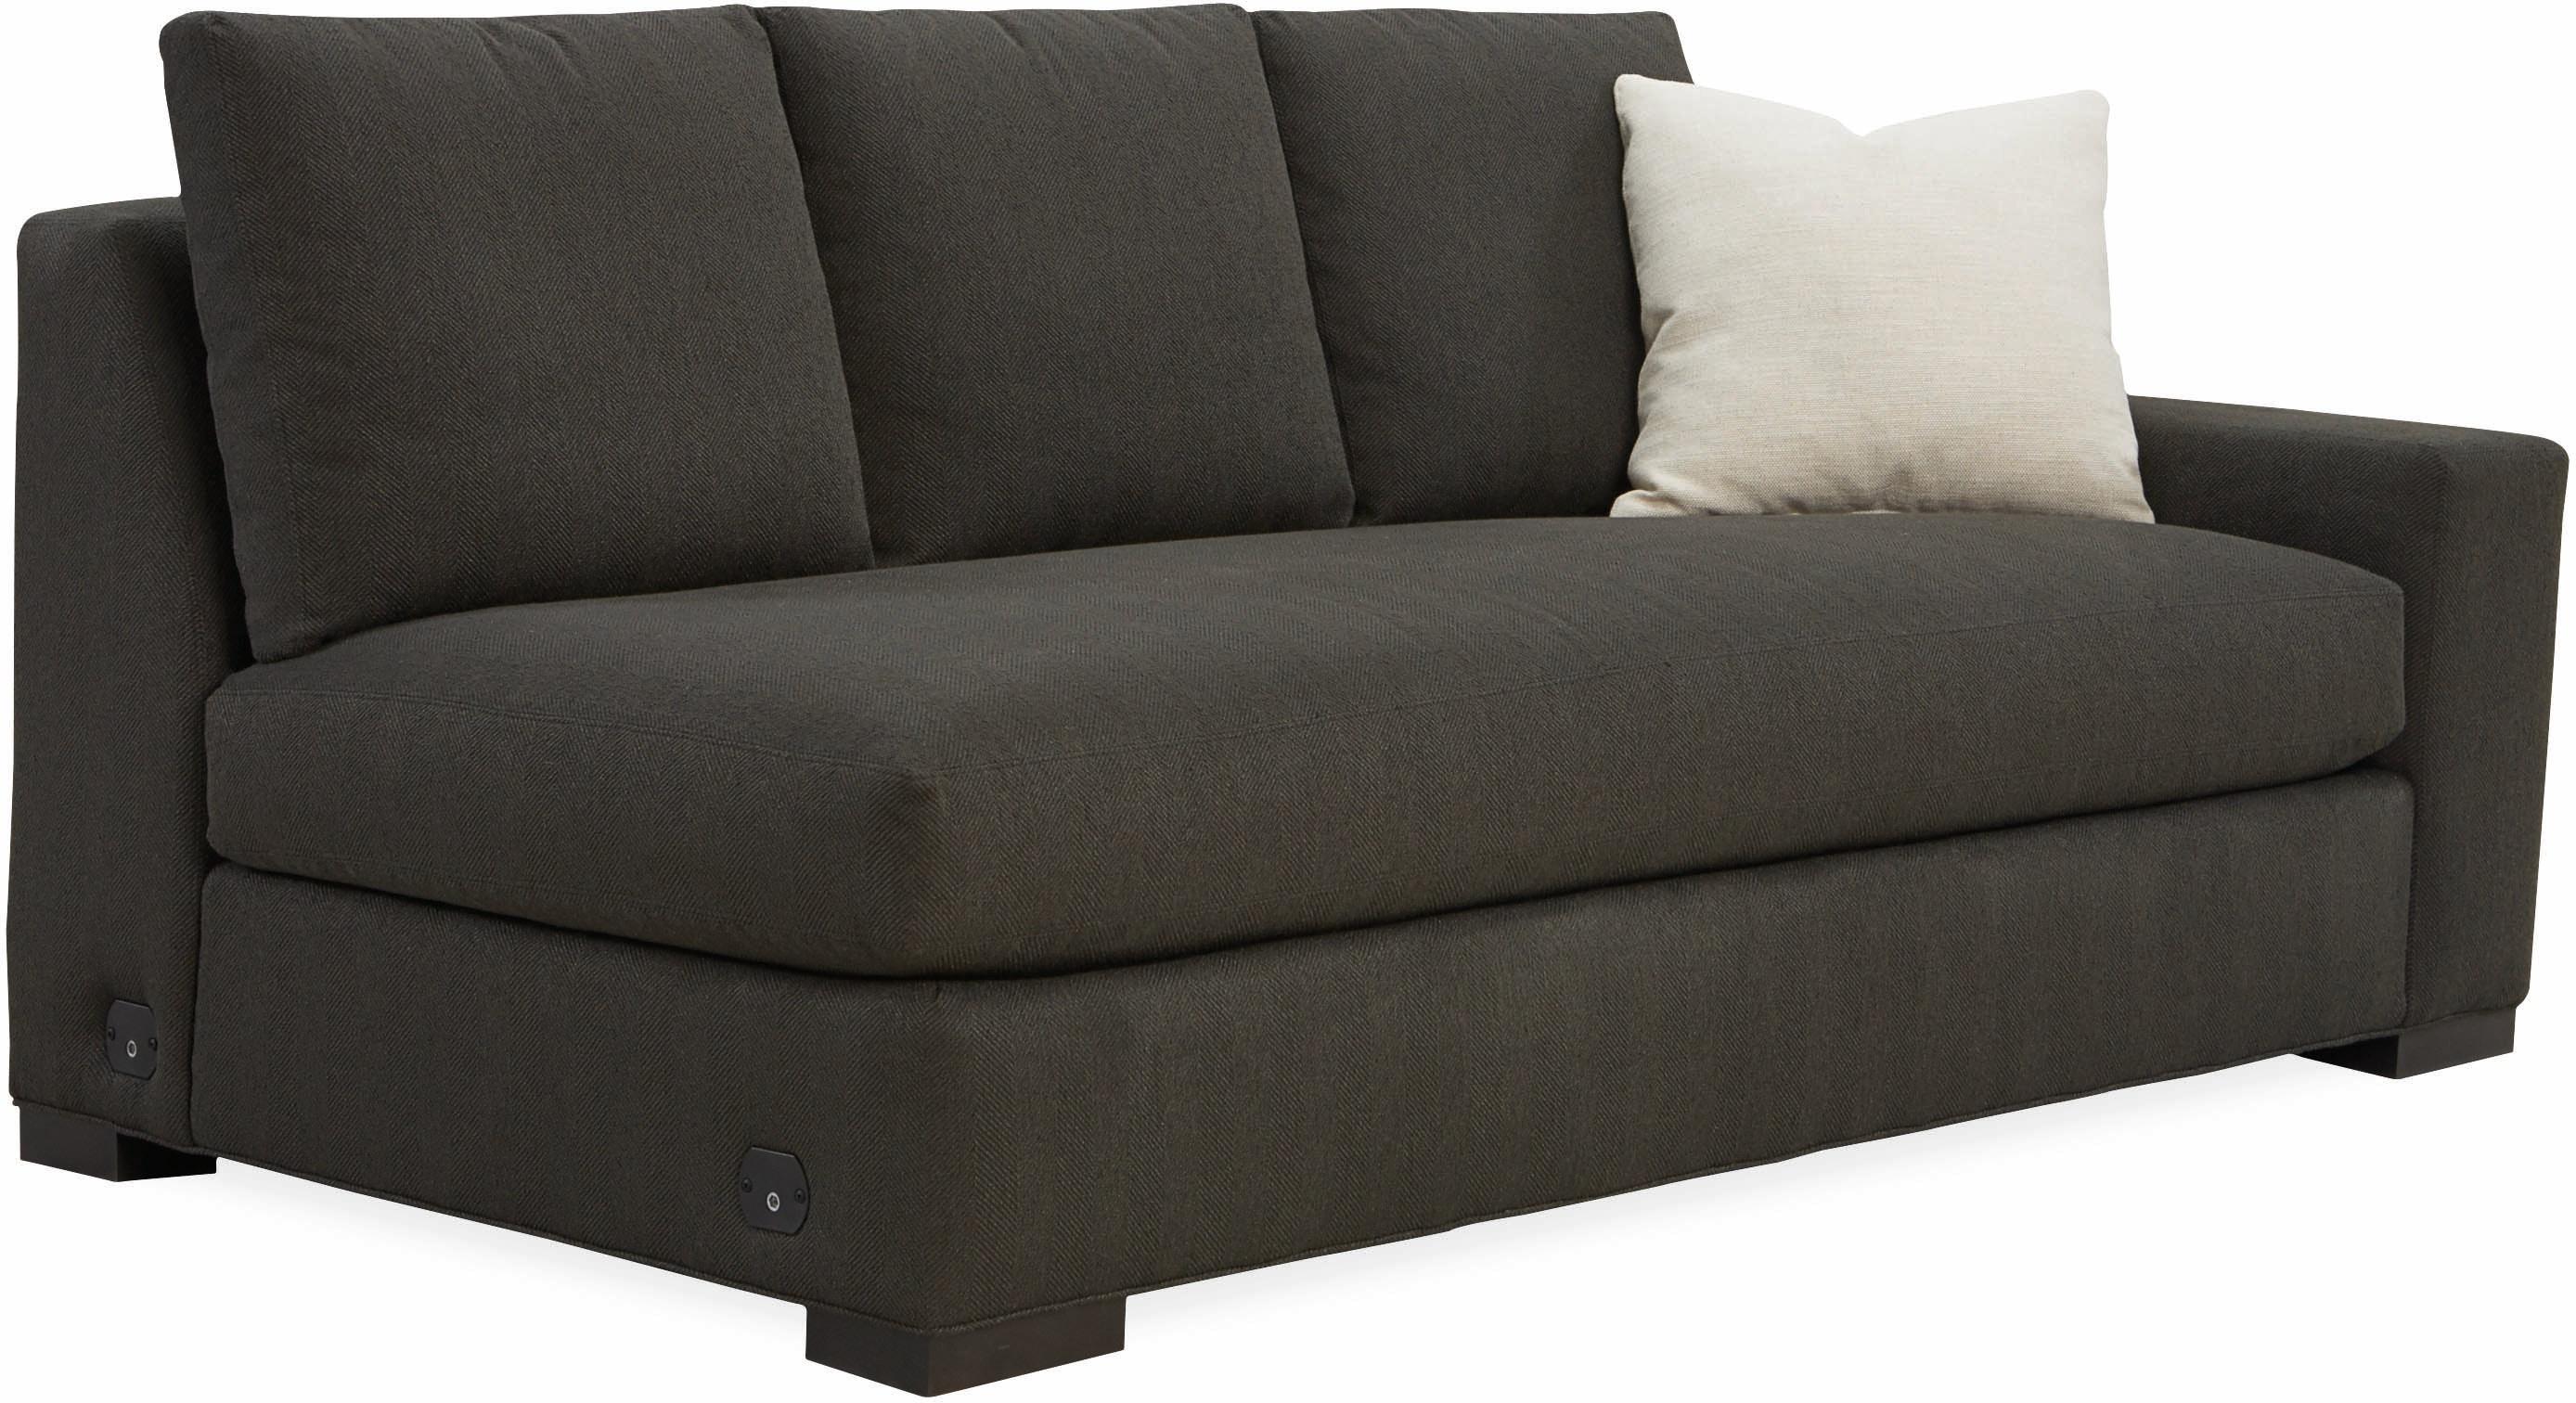 Lee Industries Living Room One Arm Sofa 5392 18rf Alyson Jon